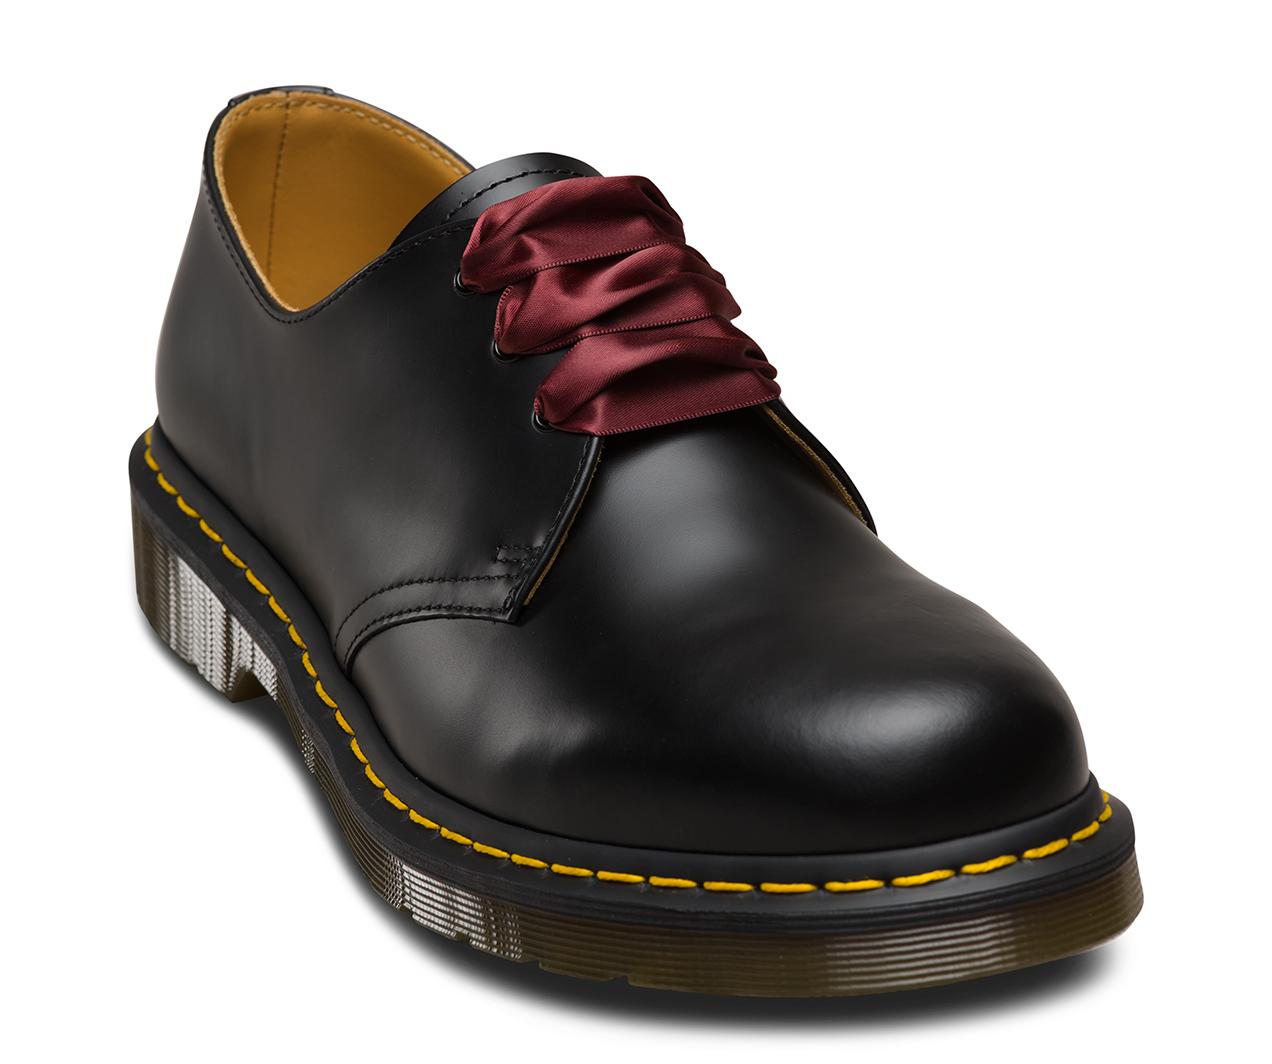 a9d5d07926052 OXBLOOD RIBBON LACE 3 EYE EA | Shoe Care and Laces | Dr. Martens ...